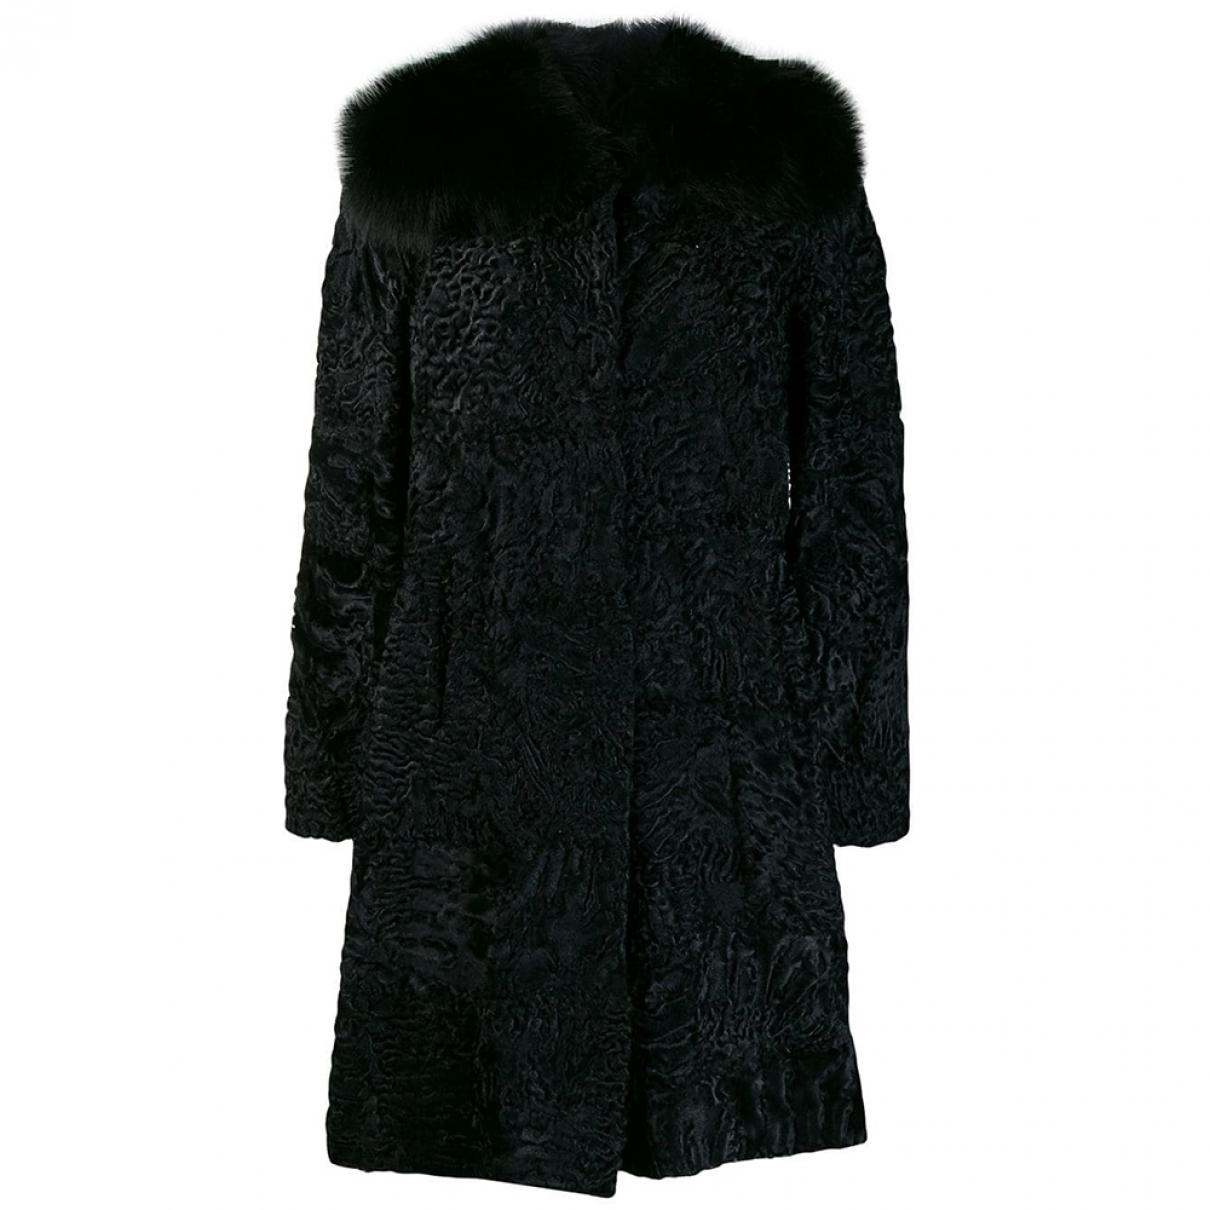 Prada - Manteau   pour femme en astrakan - noir